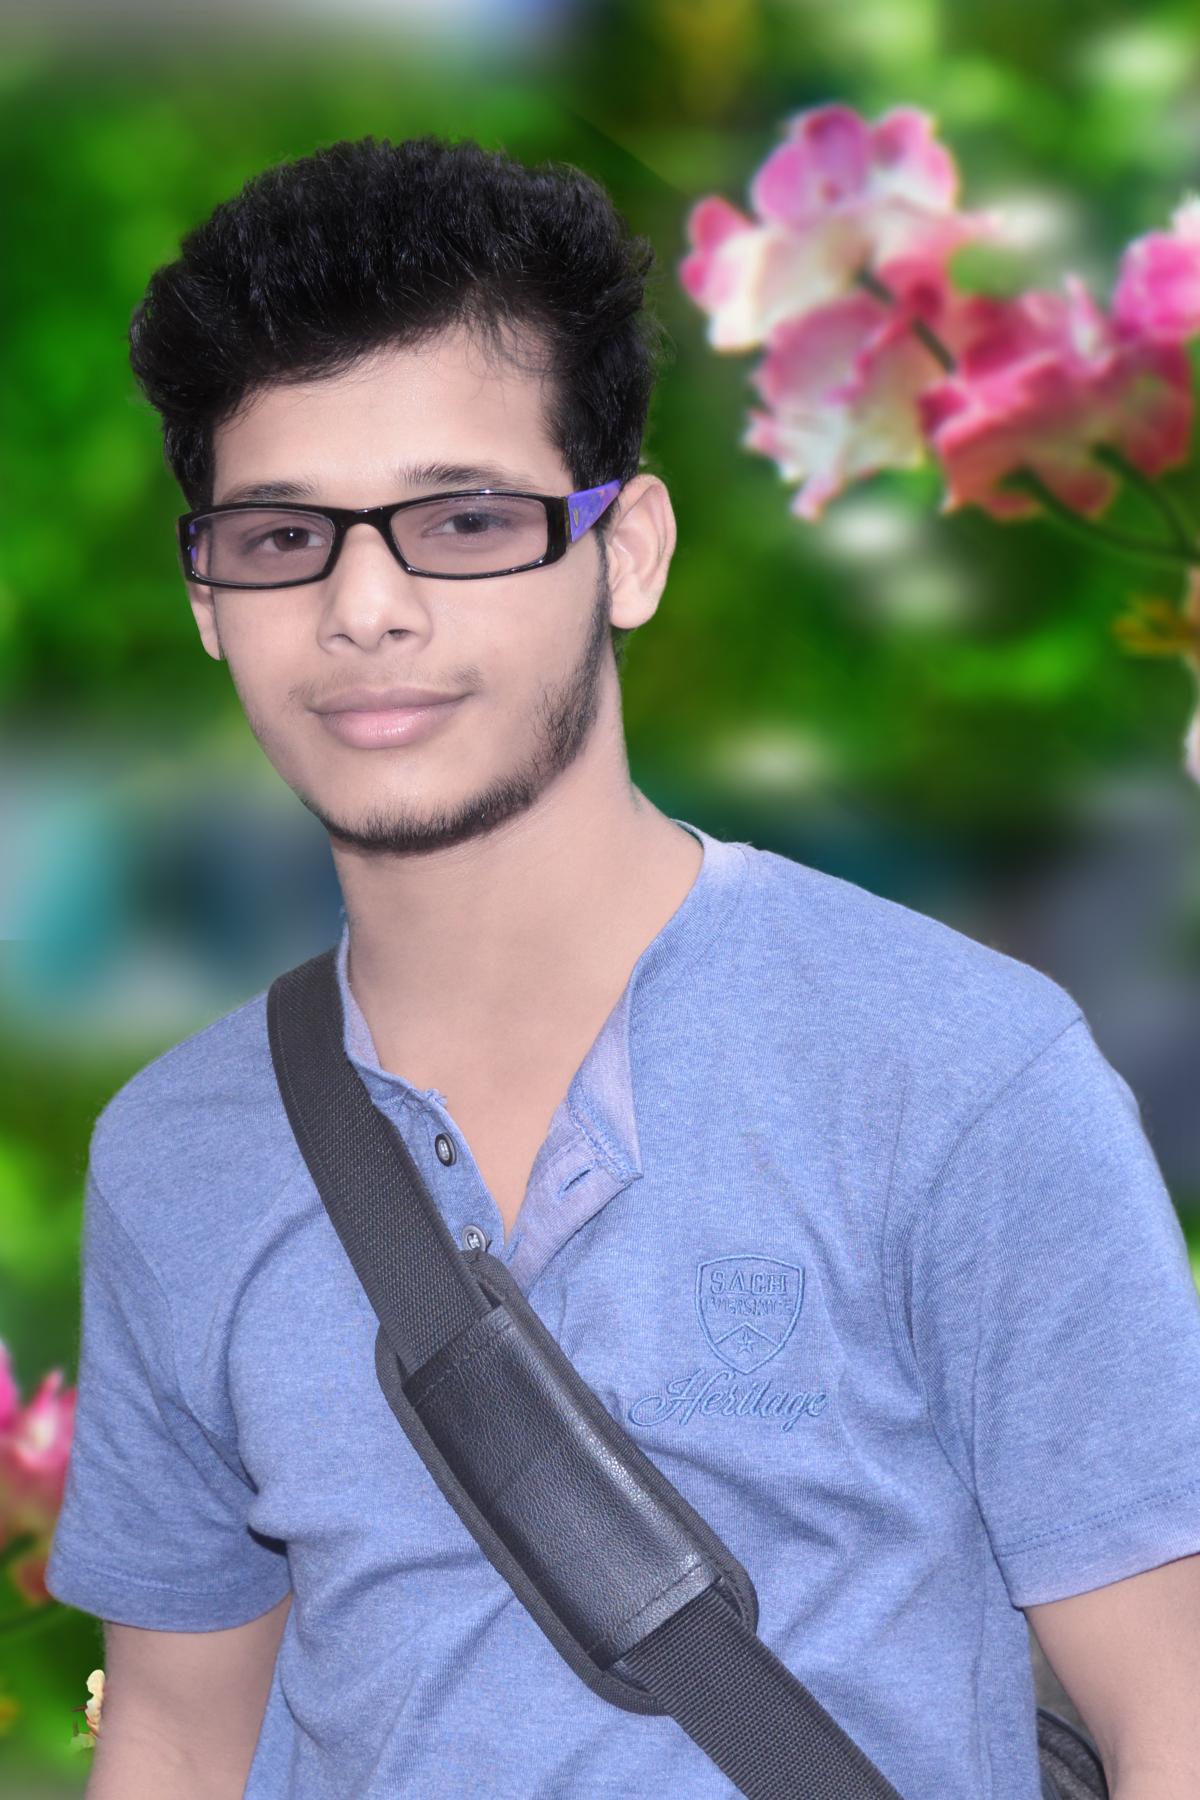 Adobe photoshop #58111